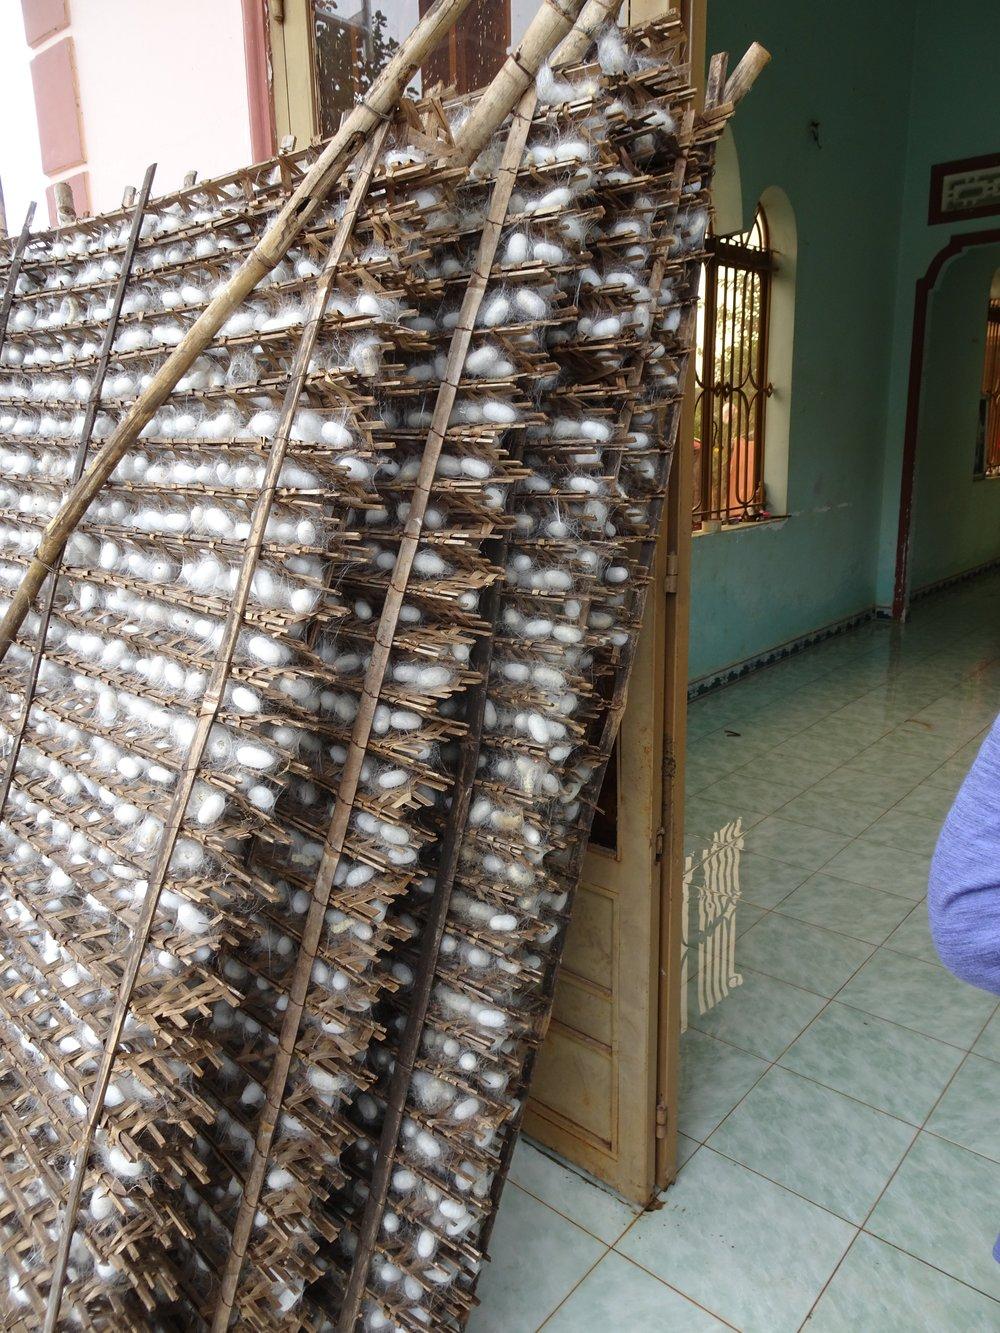 silk making in the central highlands, vietnam - m.quigley